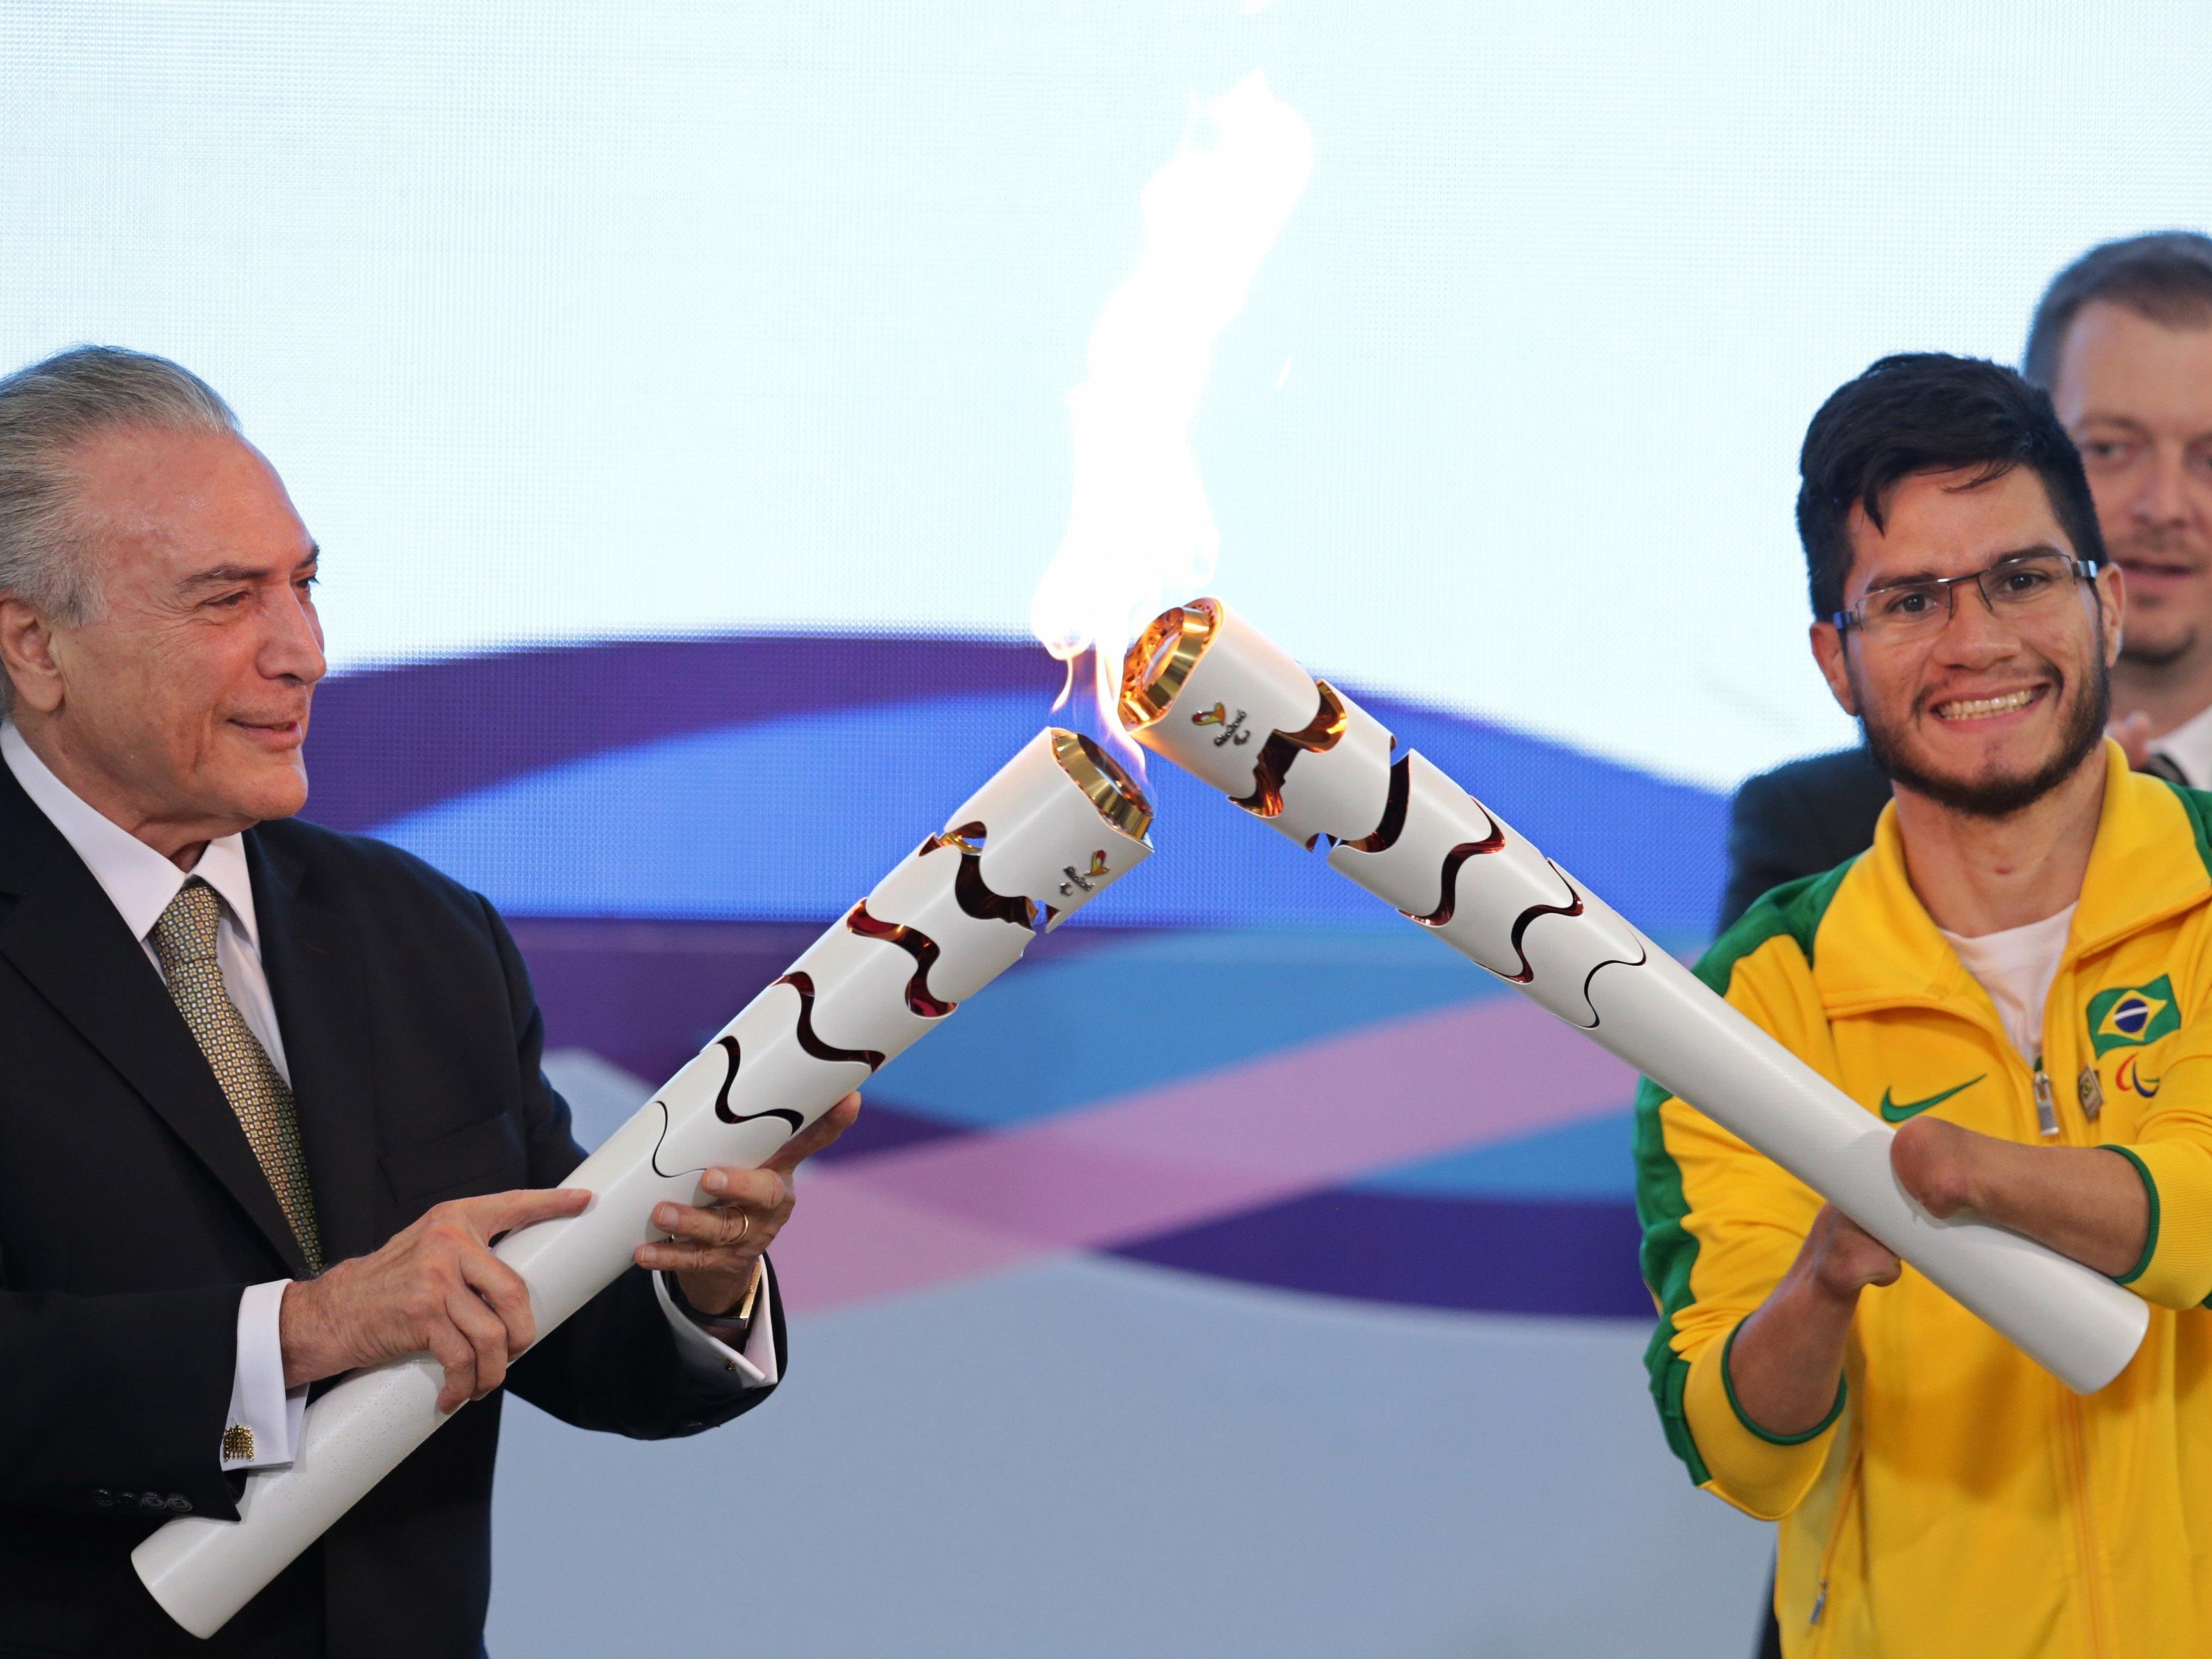 Die Paralympics starten am 7. September 2016